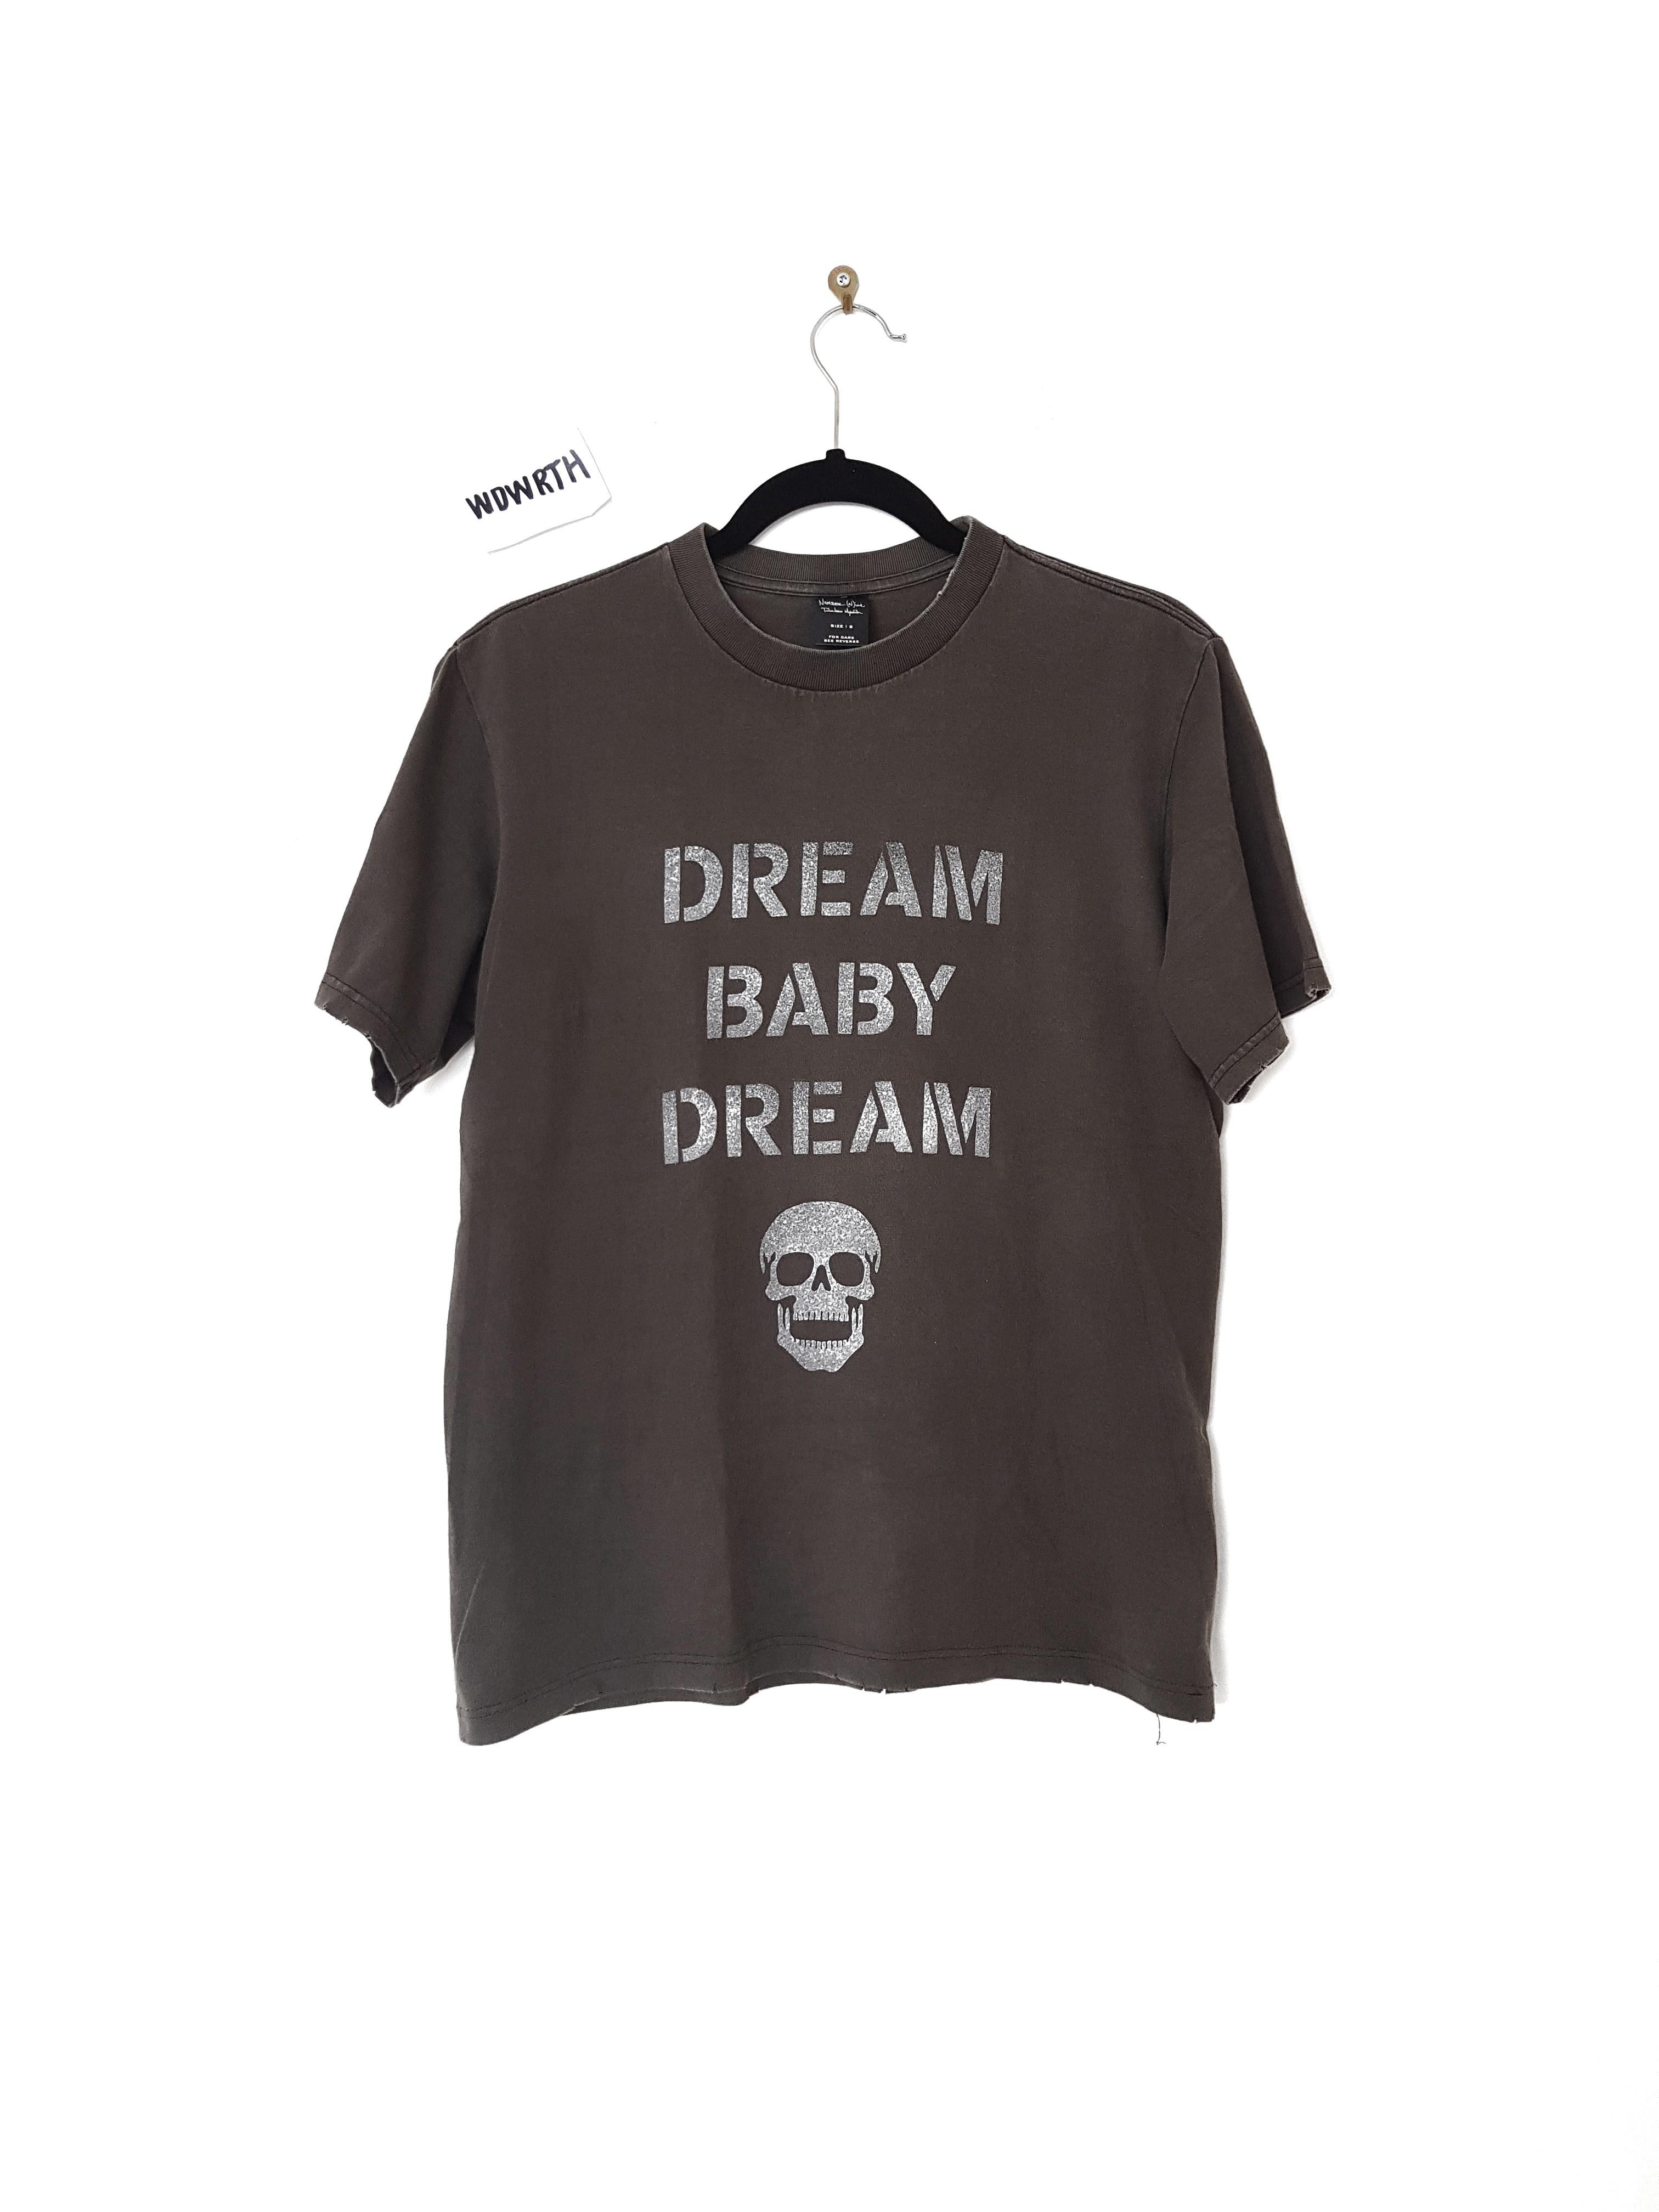 Number Nine 'Dream Baby Dream' T-Shirt